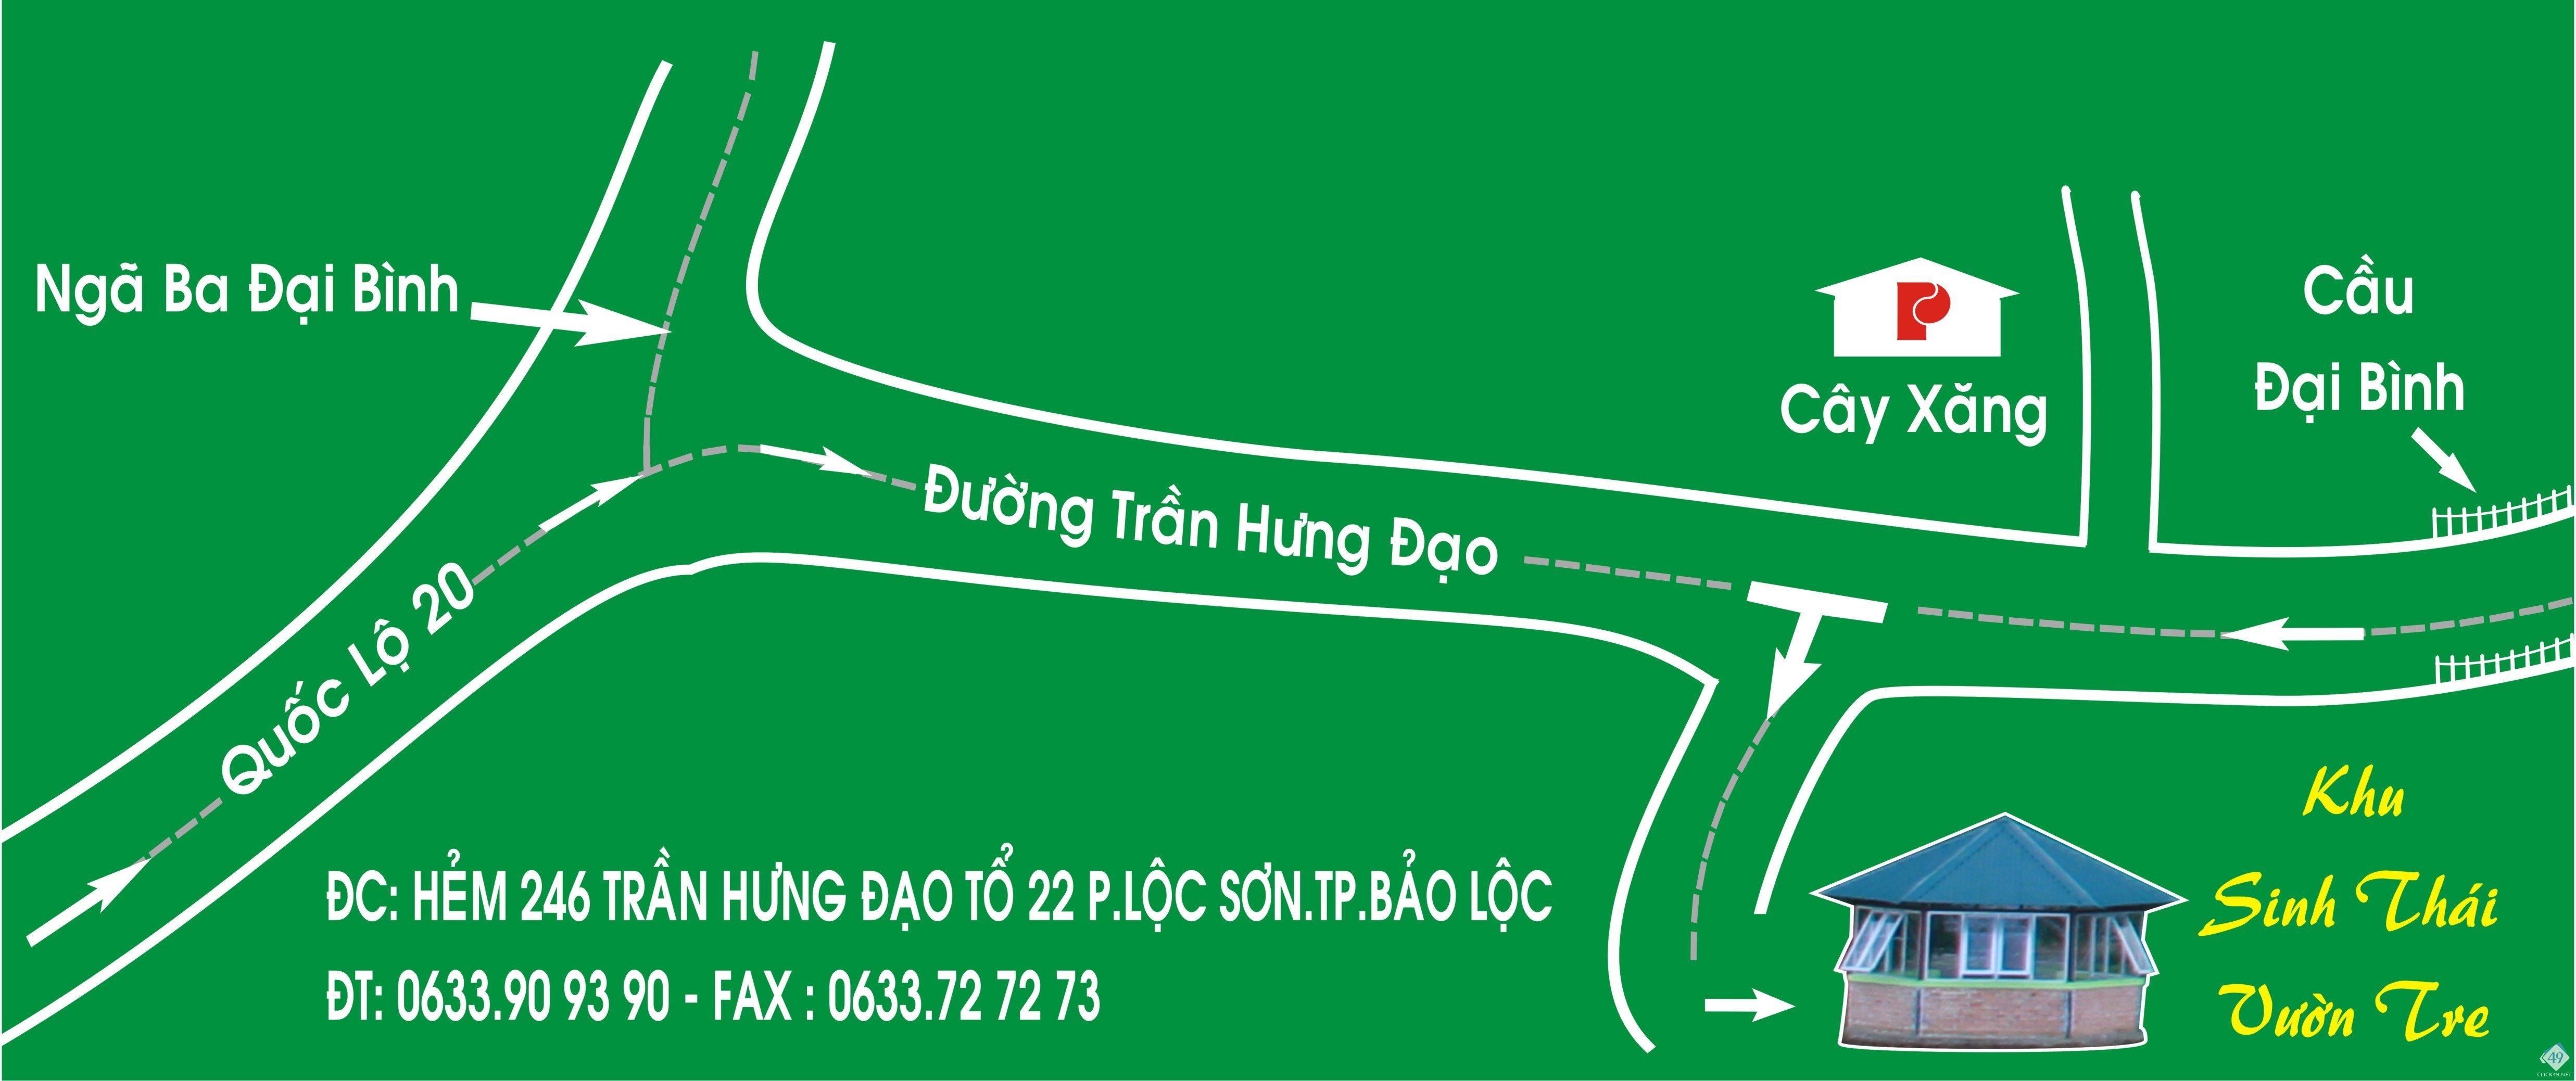 BAN CHI DAN VAO KHU SINH THAI.